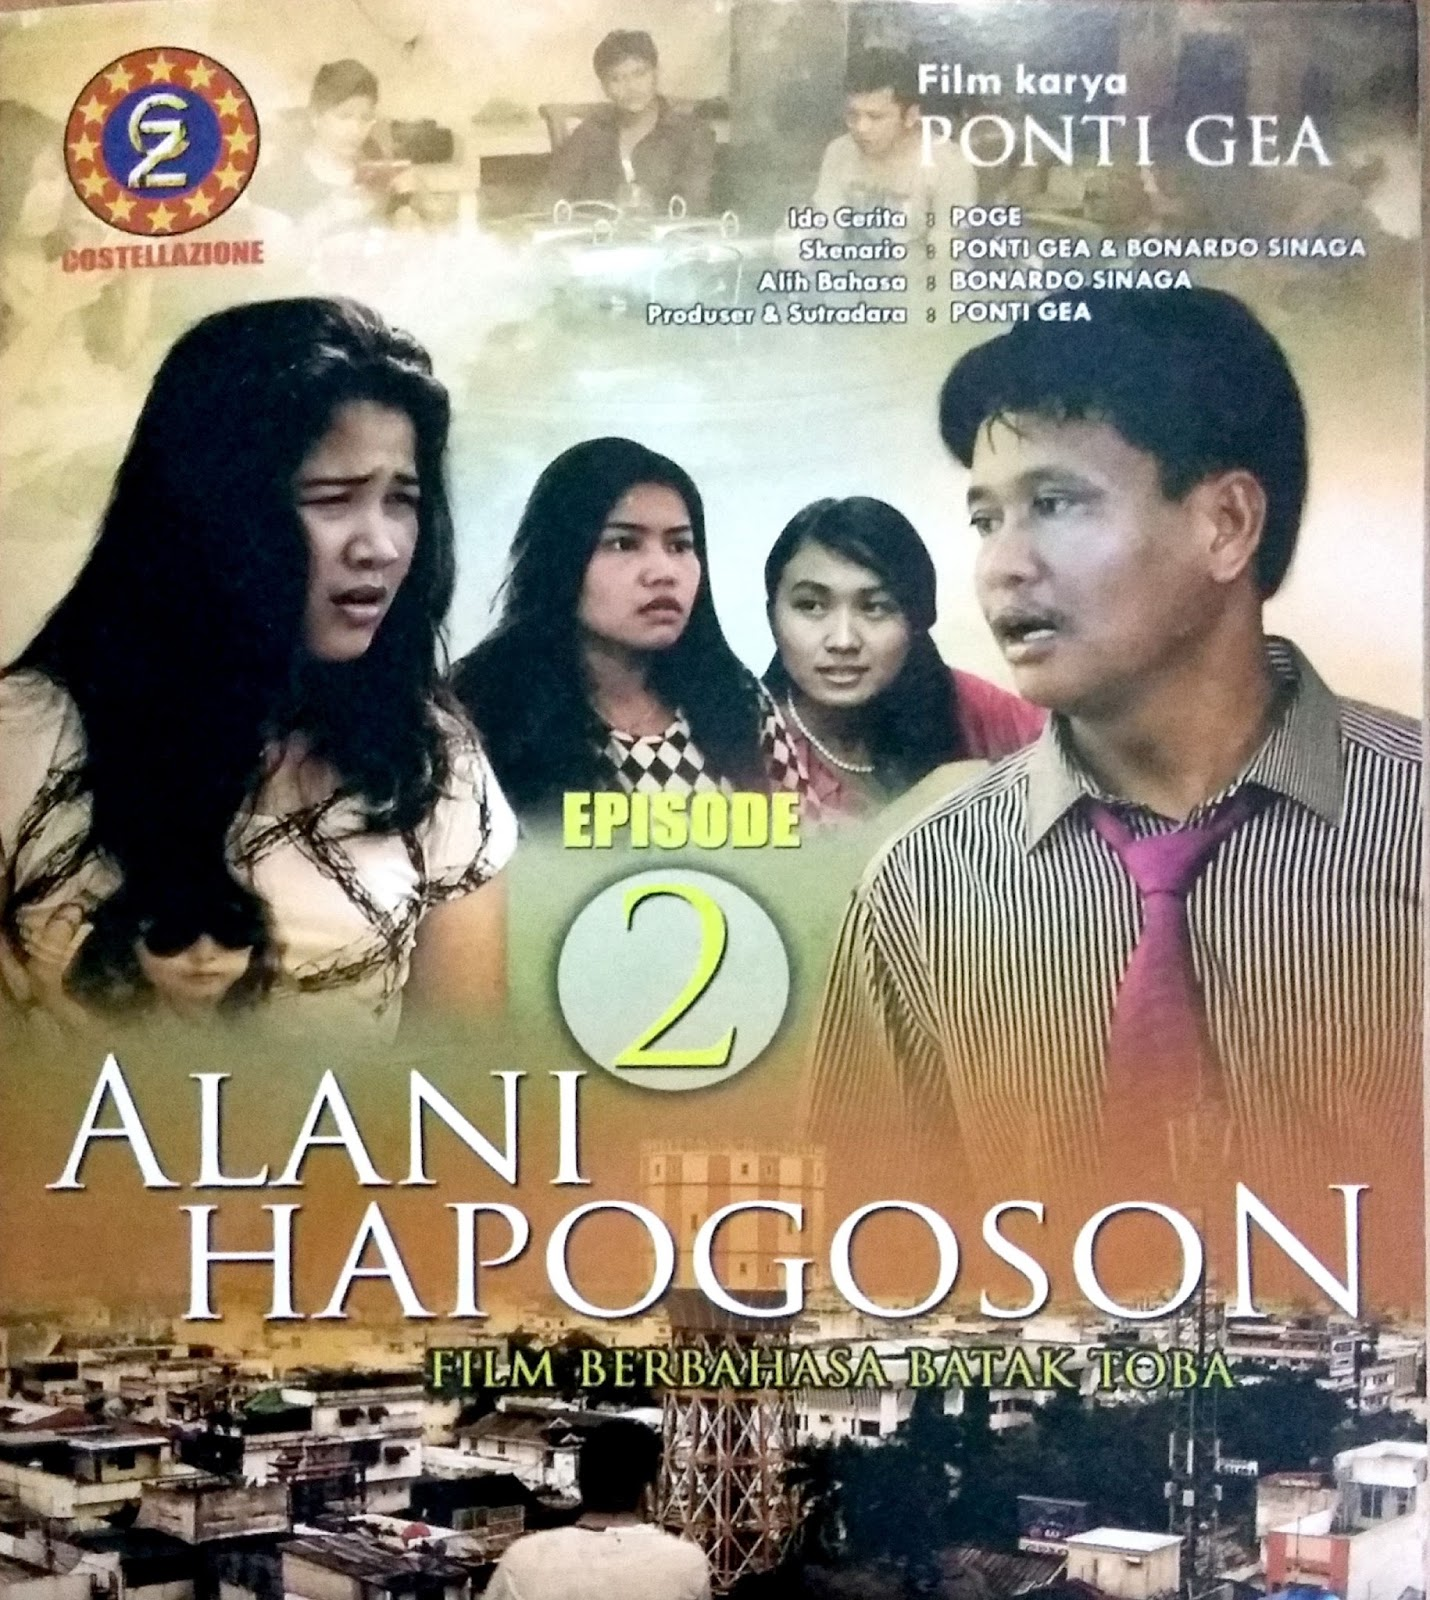 Download Lagu Batak Galau Terbaru: Lirik Lagu Batak : Film Batak Toba Alani Hapogoson